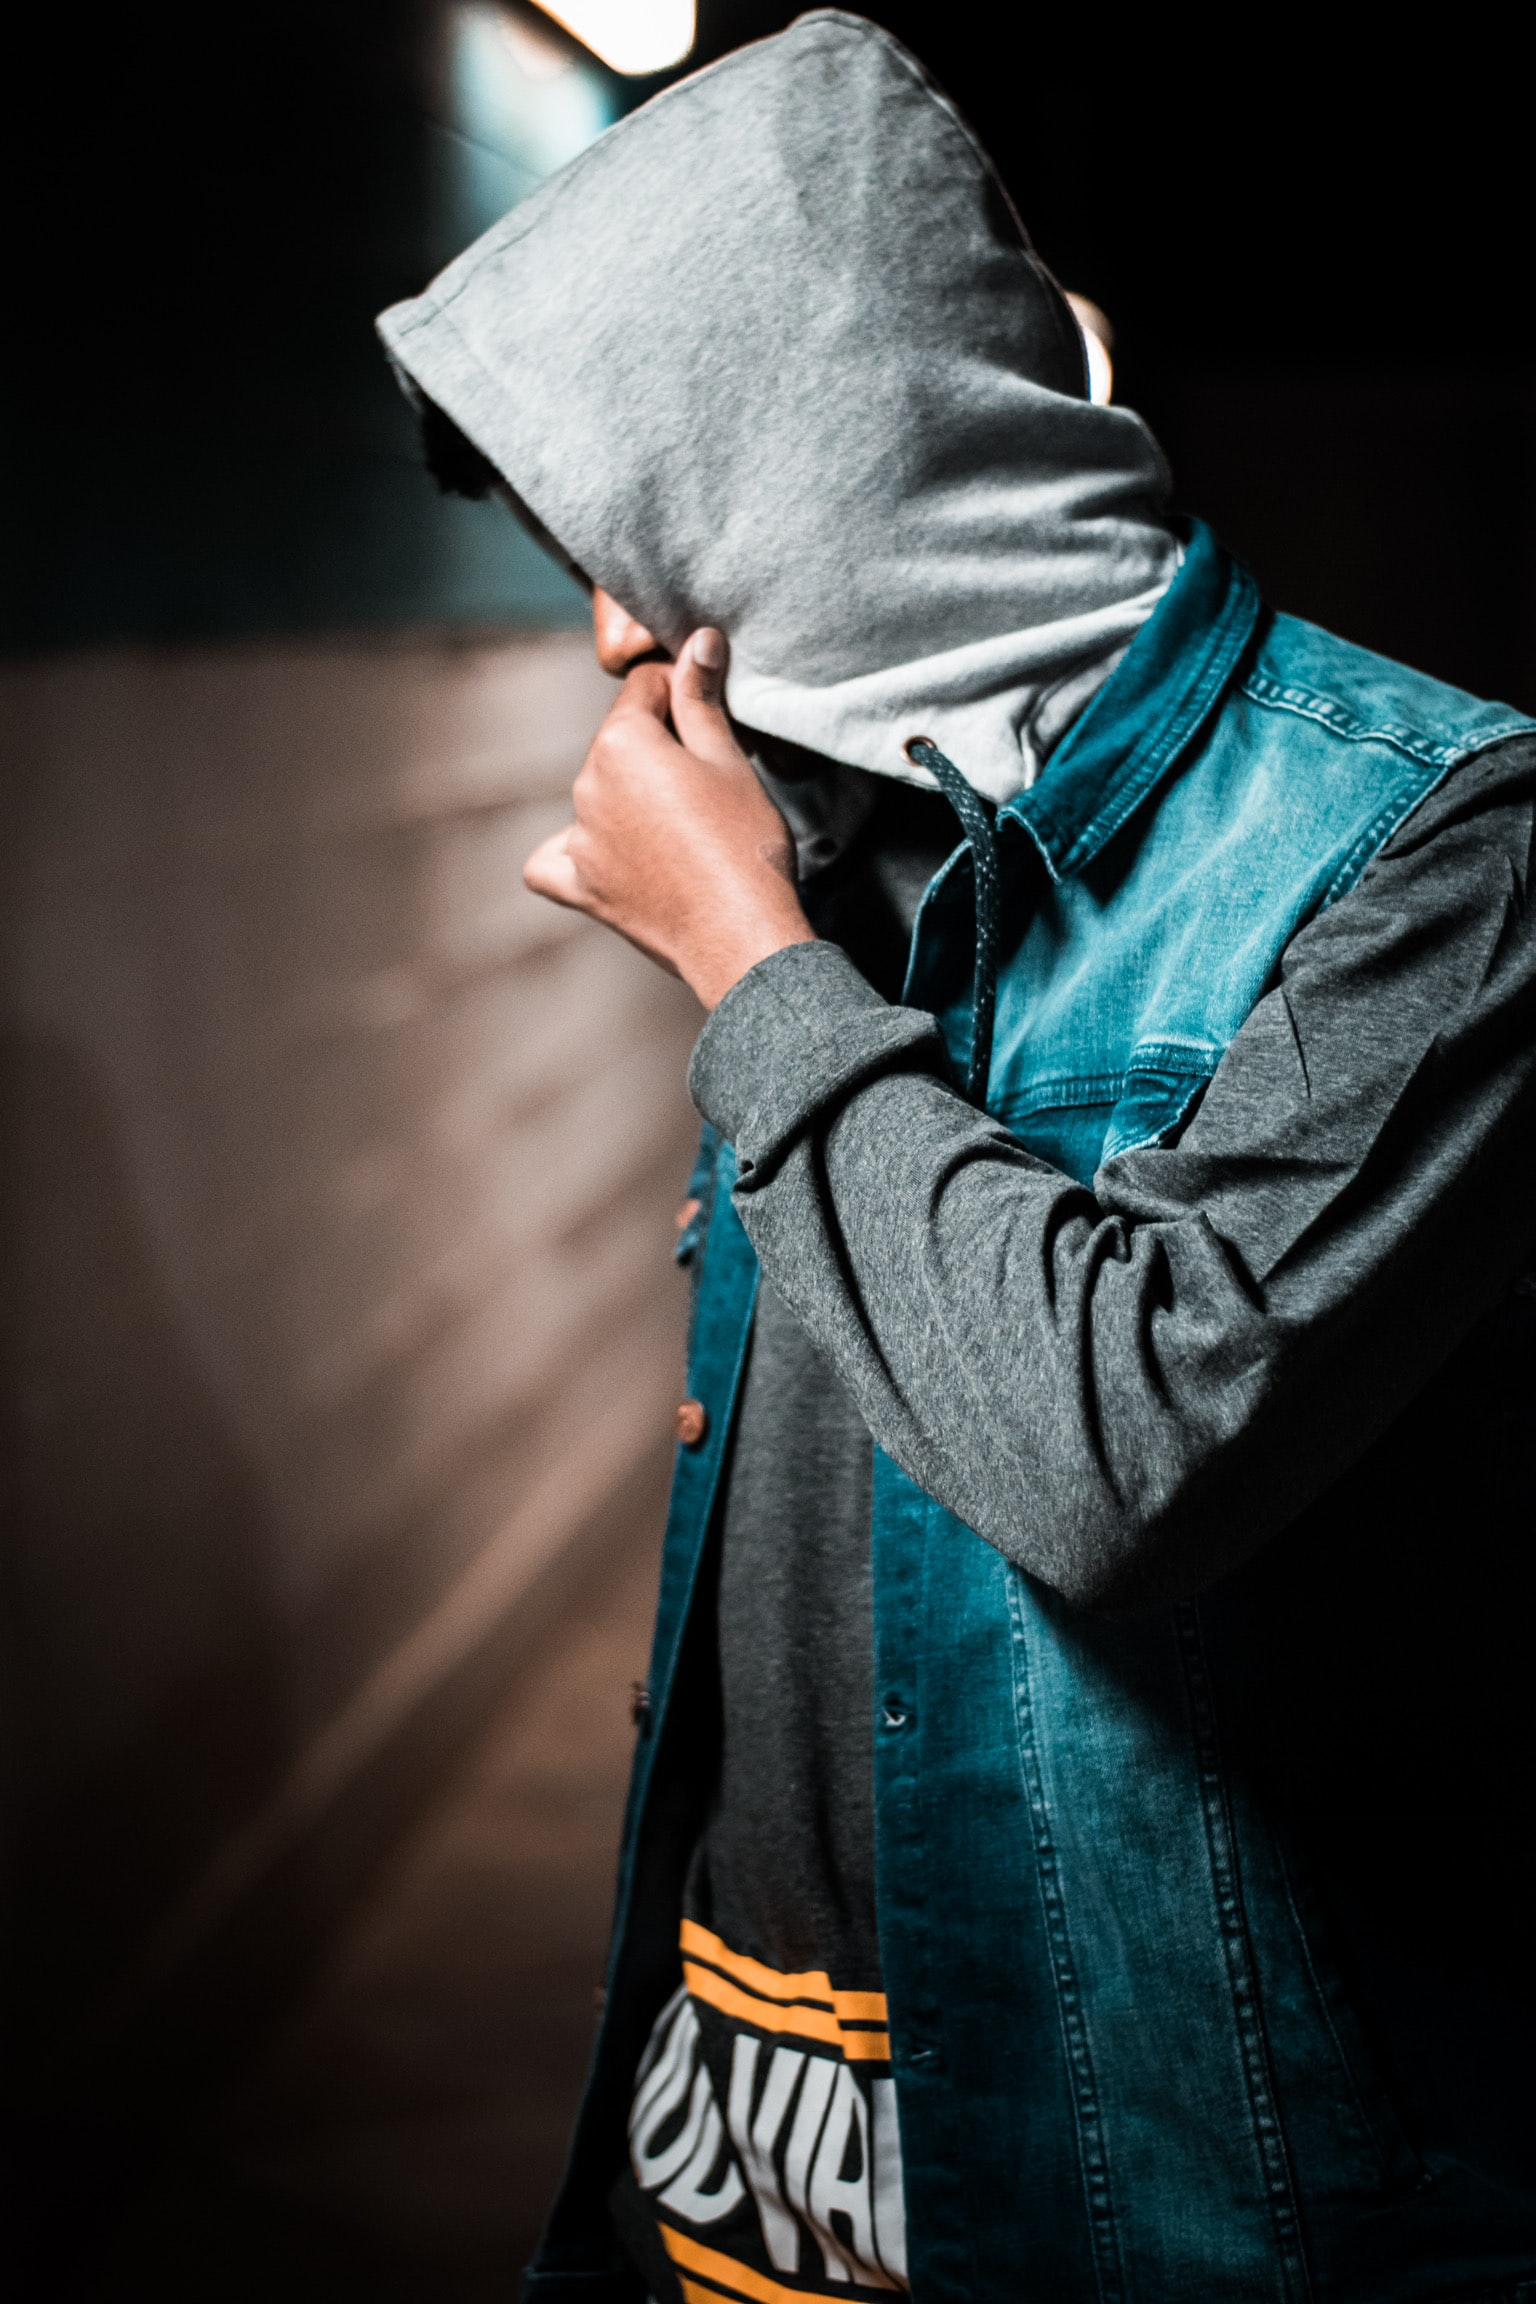 man wearing denim jacket standing near wall